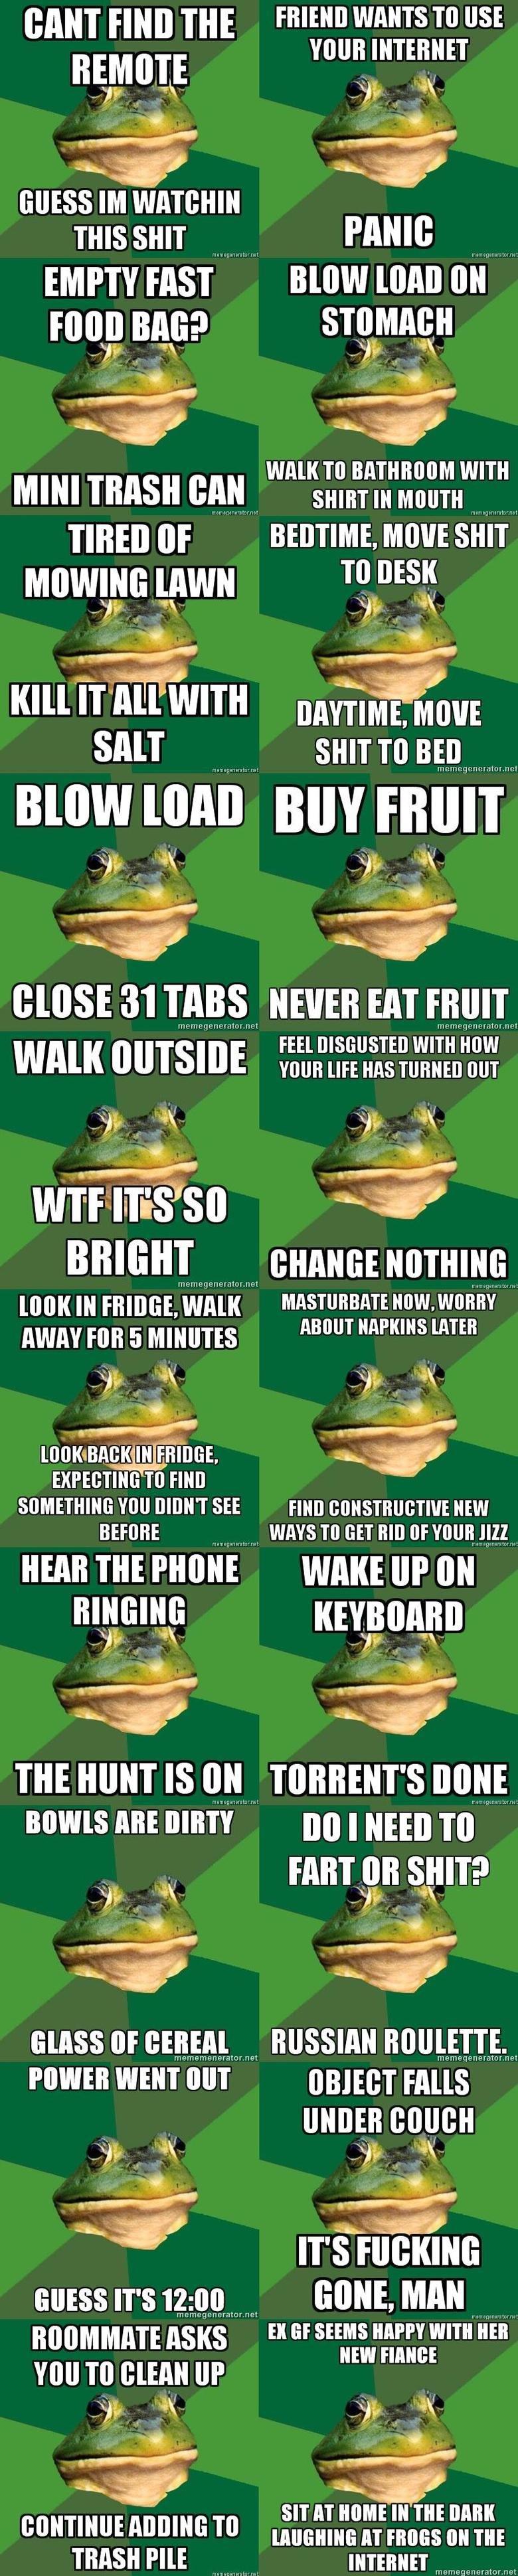 FBF. lets bring this guy back!.. Bachelor frog is best frog